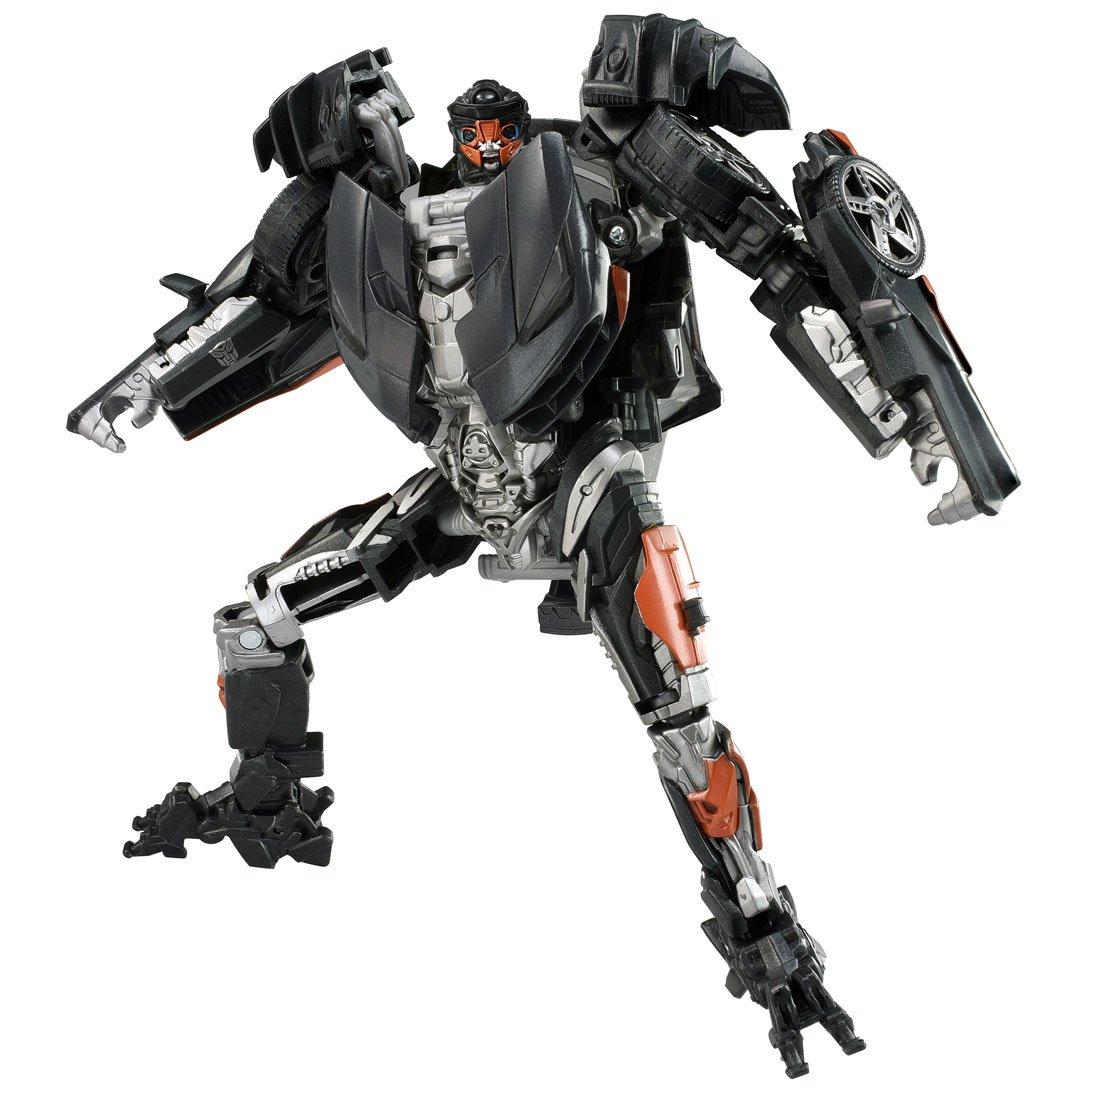 promocionales de incentivo Transformers TLK- TLK- TLK- 20 AUTOBOT HOT ROD  venta directa de fábrica